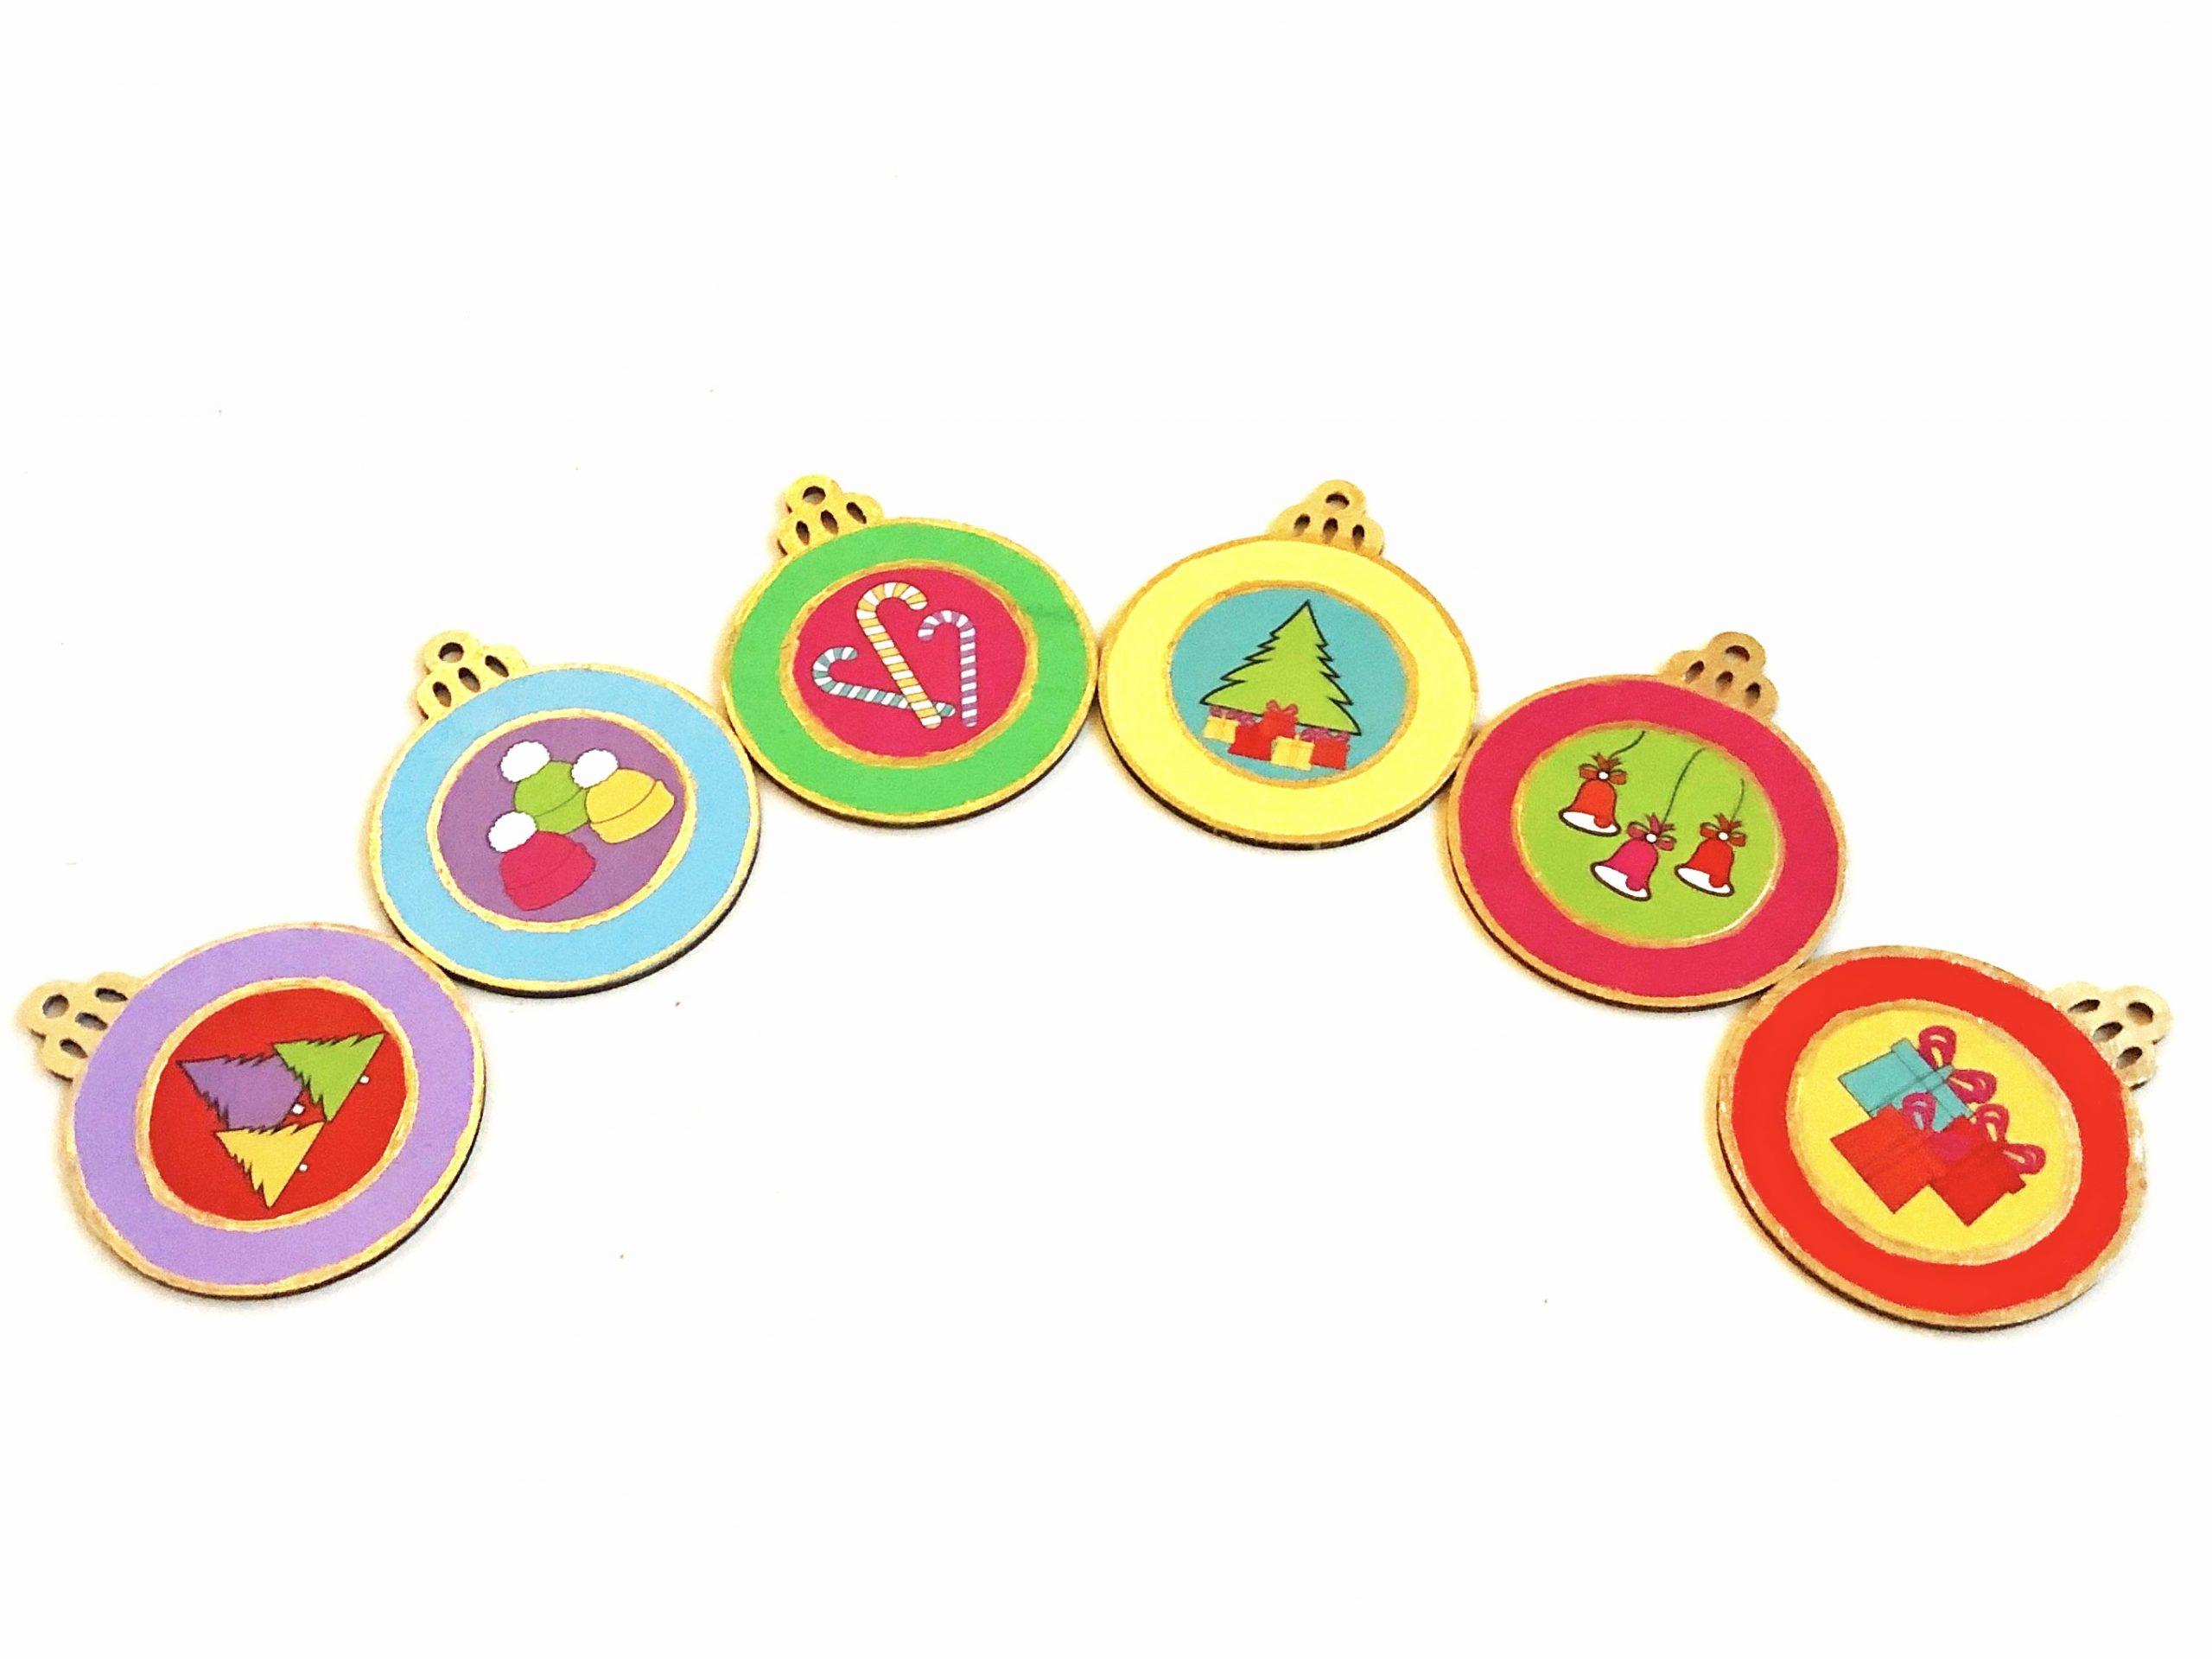 Colorful DIY decoupage ornaments